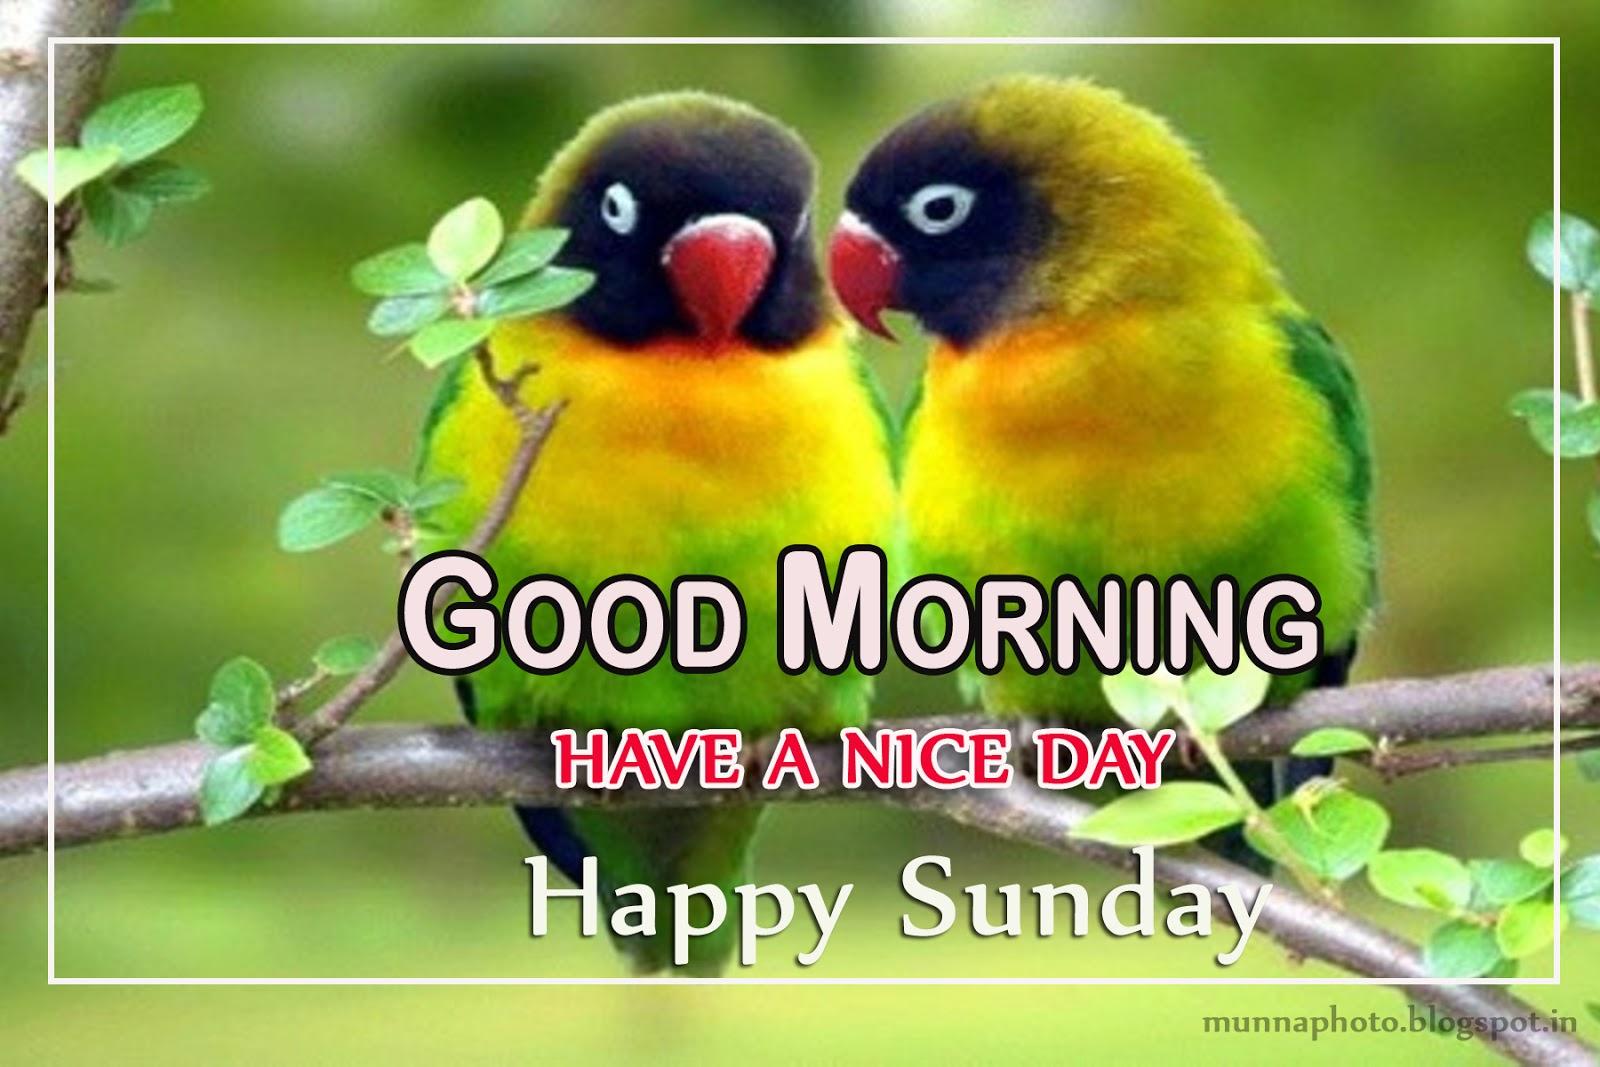 Munna Photo: cute-love-birds-good morning--photos-background